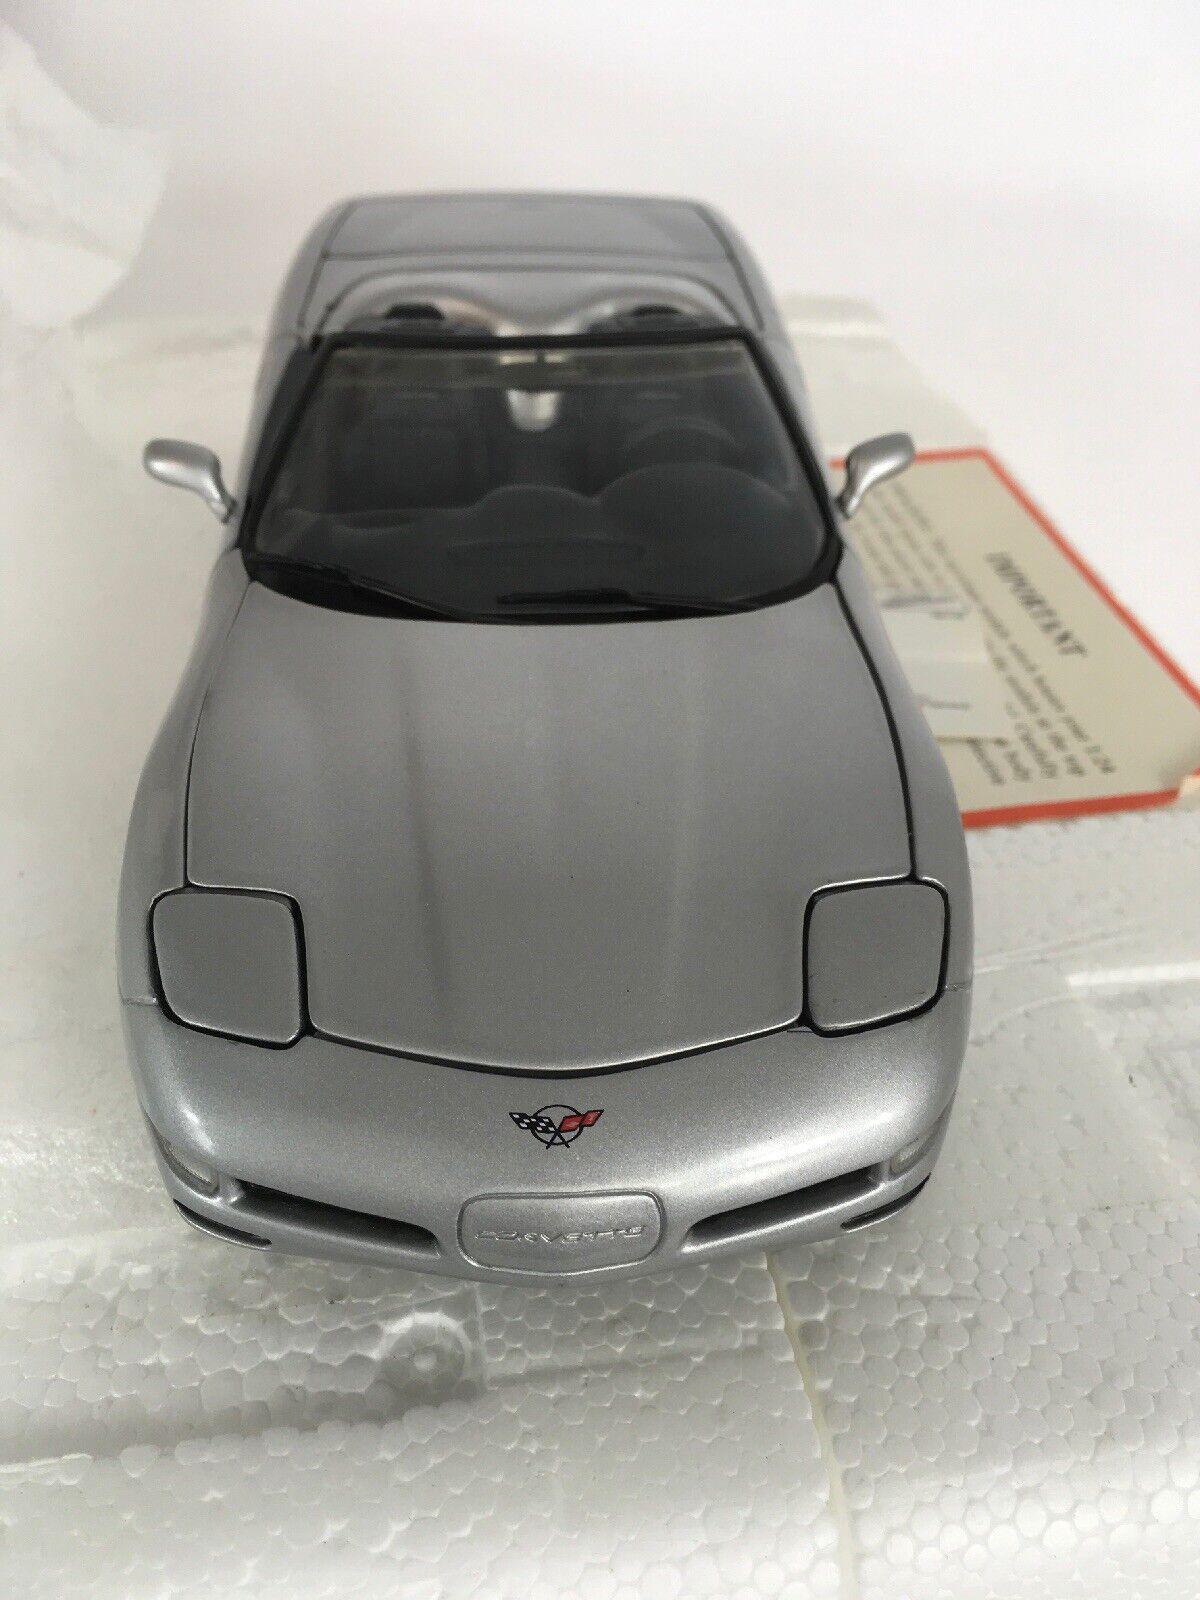 para barato Franklin Franklin Franklin mint Corvette 1 24 1998 modelo de precisión Converdeible Nuevo En Caja Con Papeles  apresurado a ver